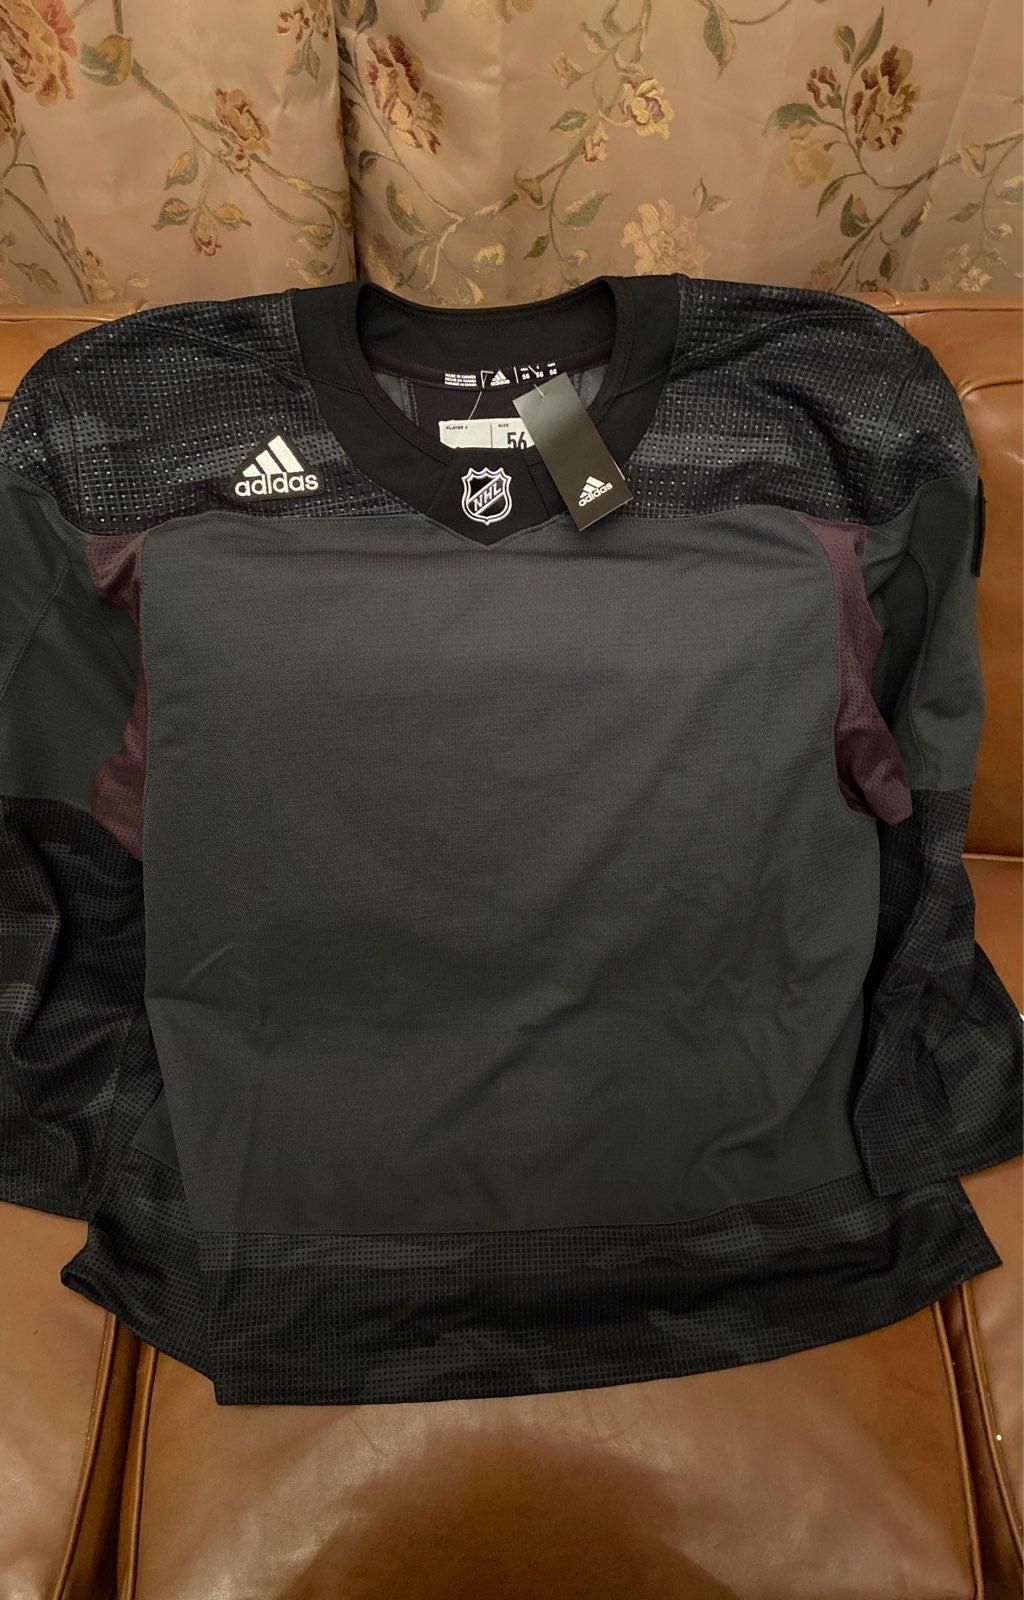 NHL Adidas Military Camo Blank Jersey